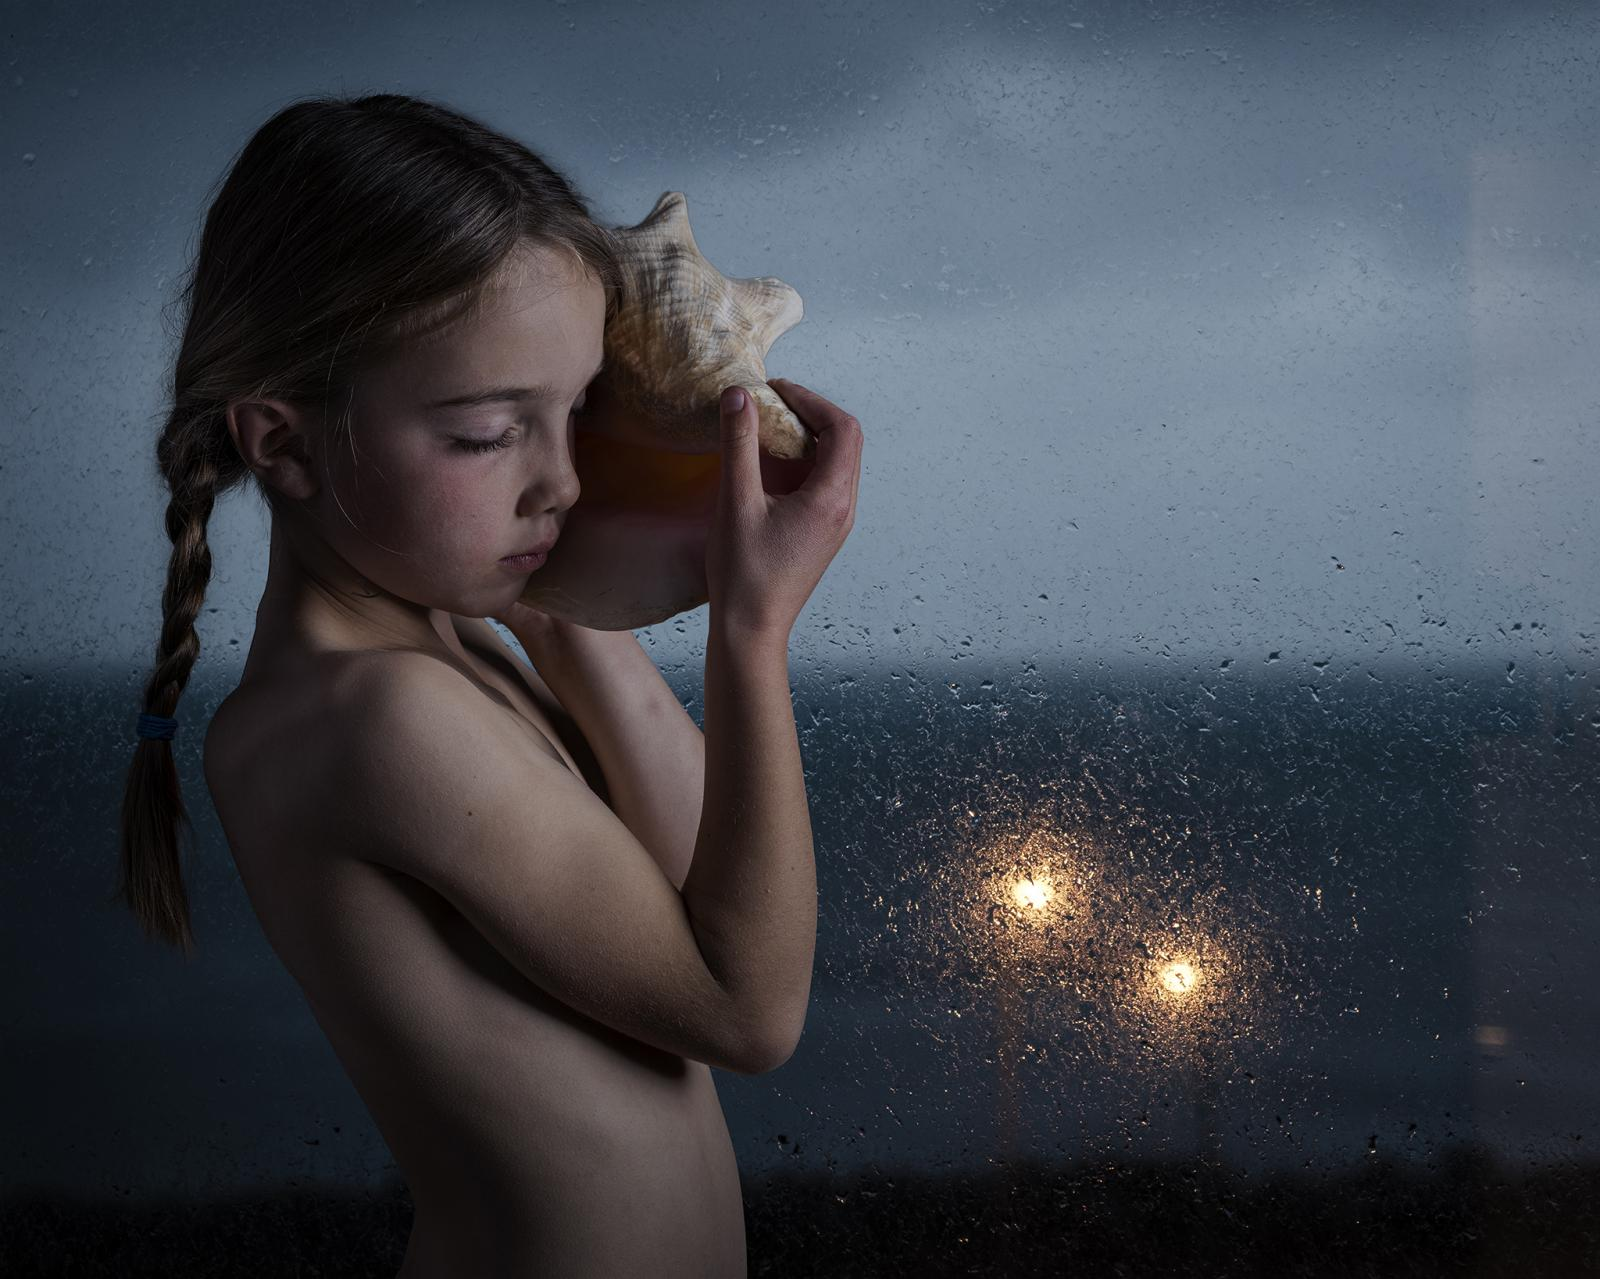 Photography image - Loading Lur_window_shell.jpg